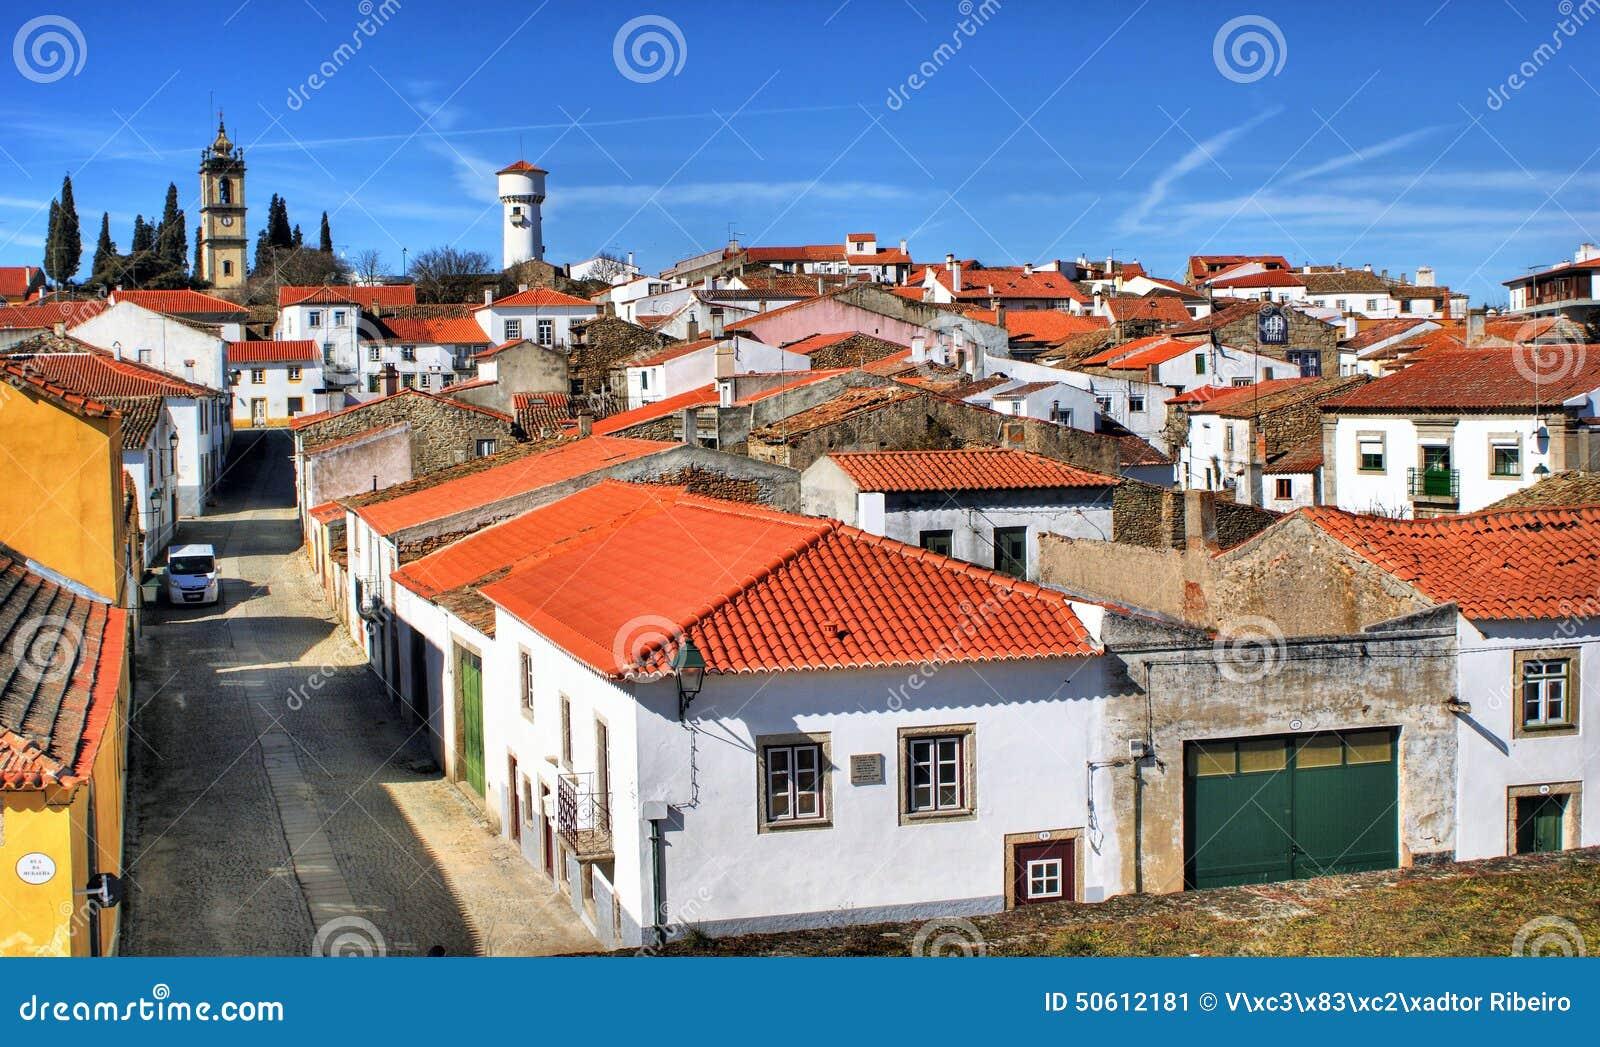 Almeida historical village